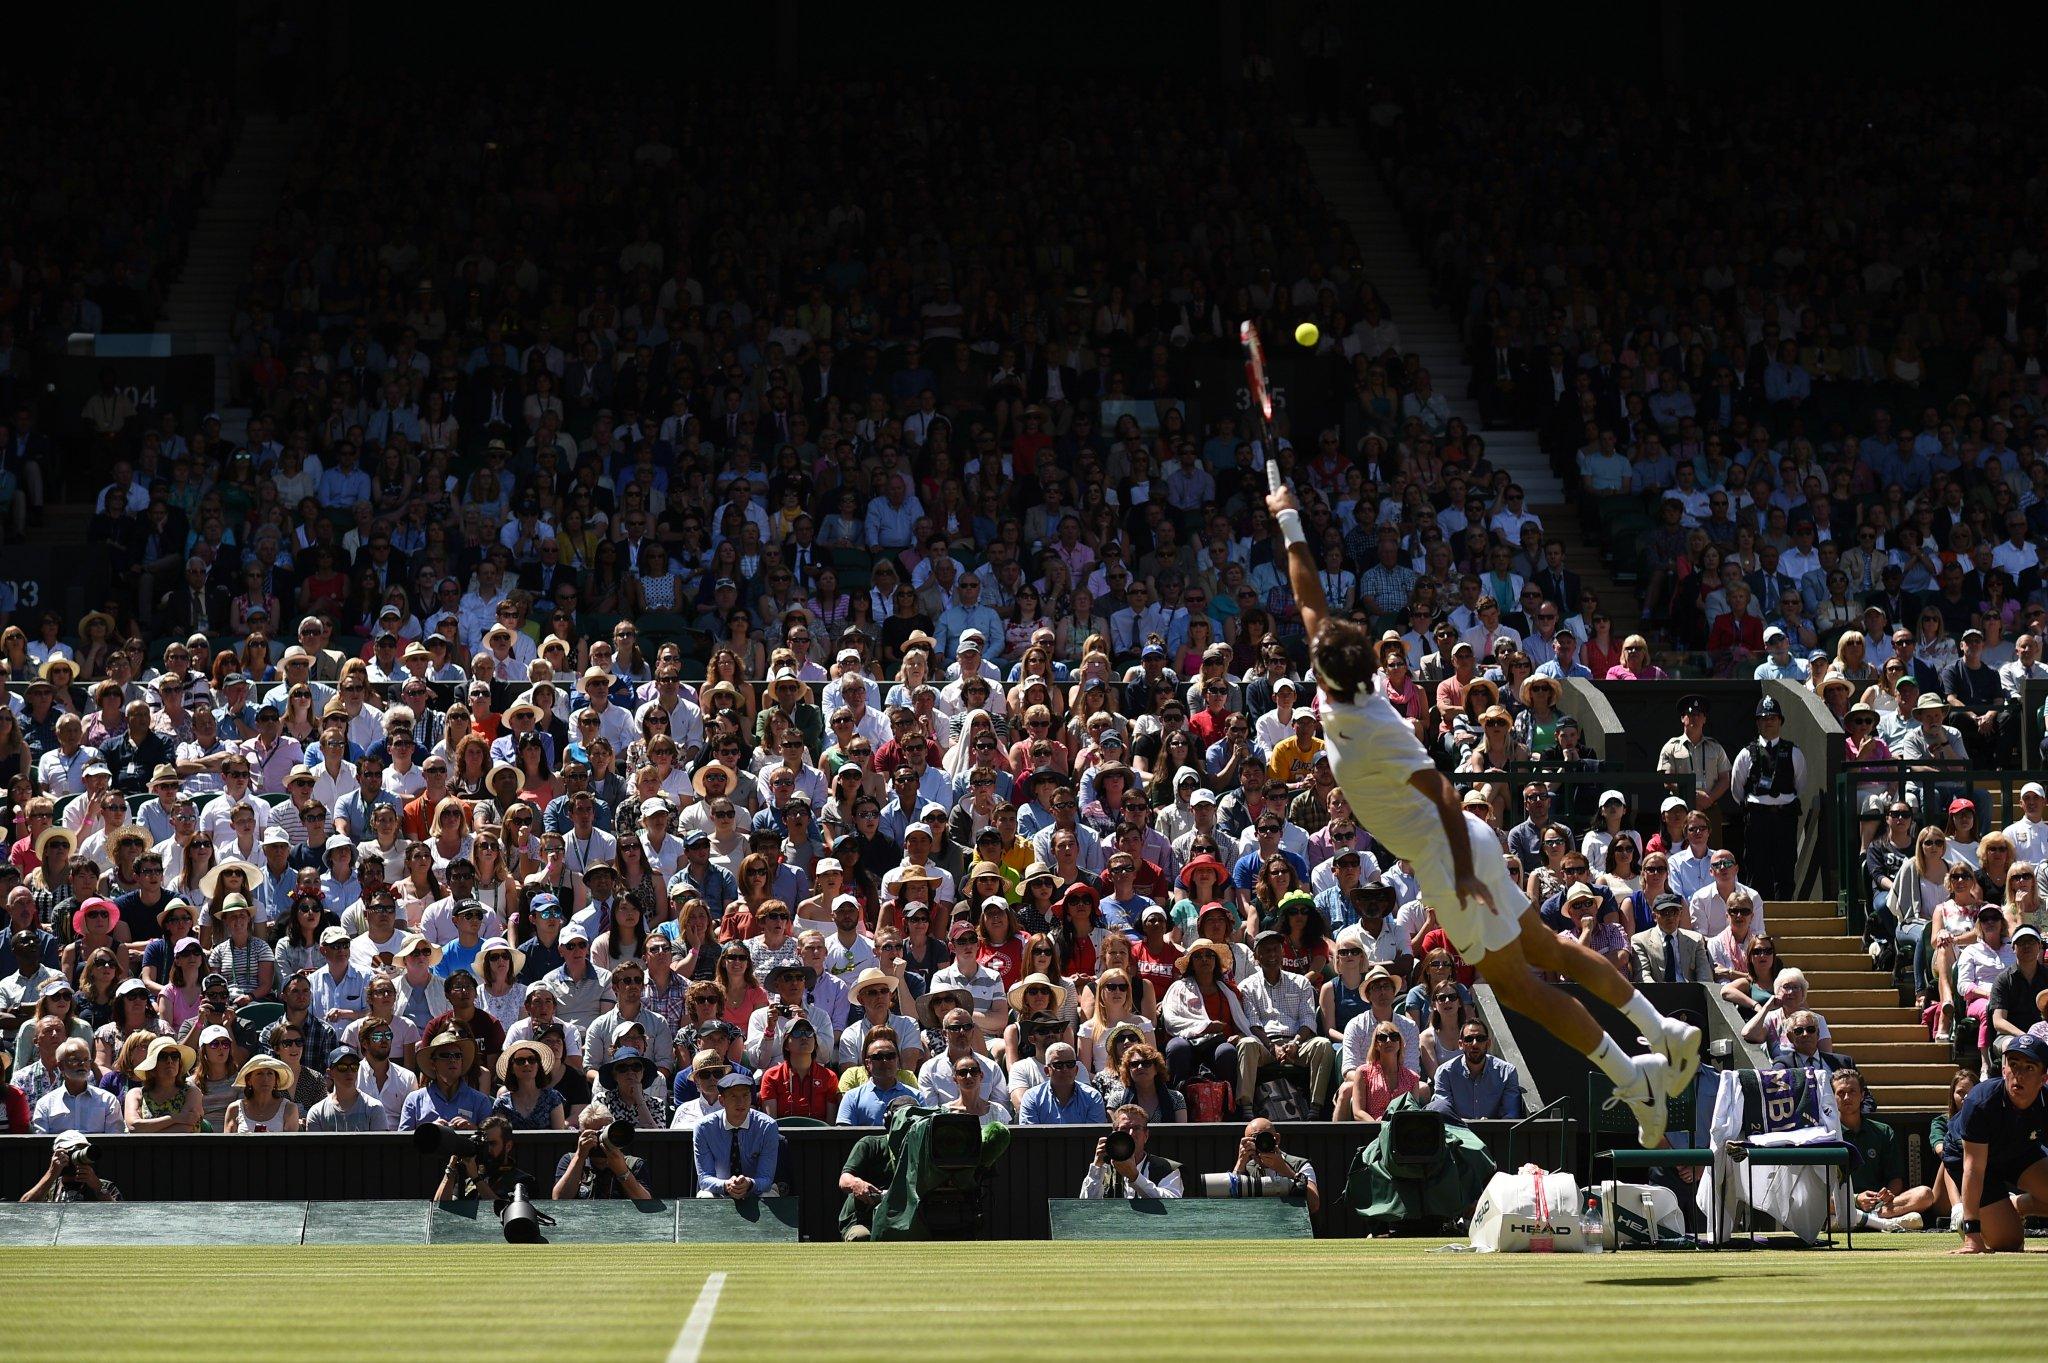 Roger Federer en el torneo de Wimbledon 2016. Cortesía del artista